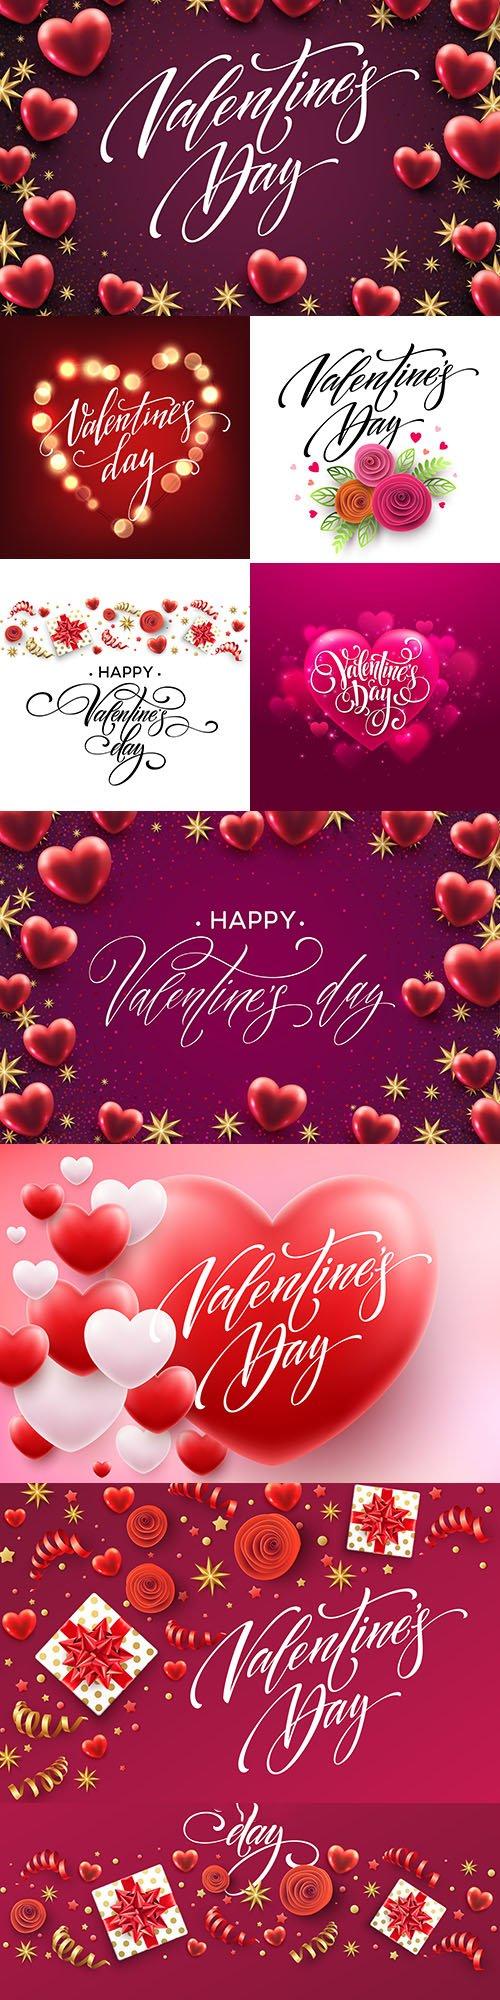 Happy Valentine's Day romantic decorative illustrations 29